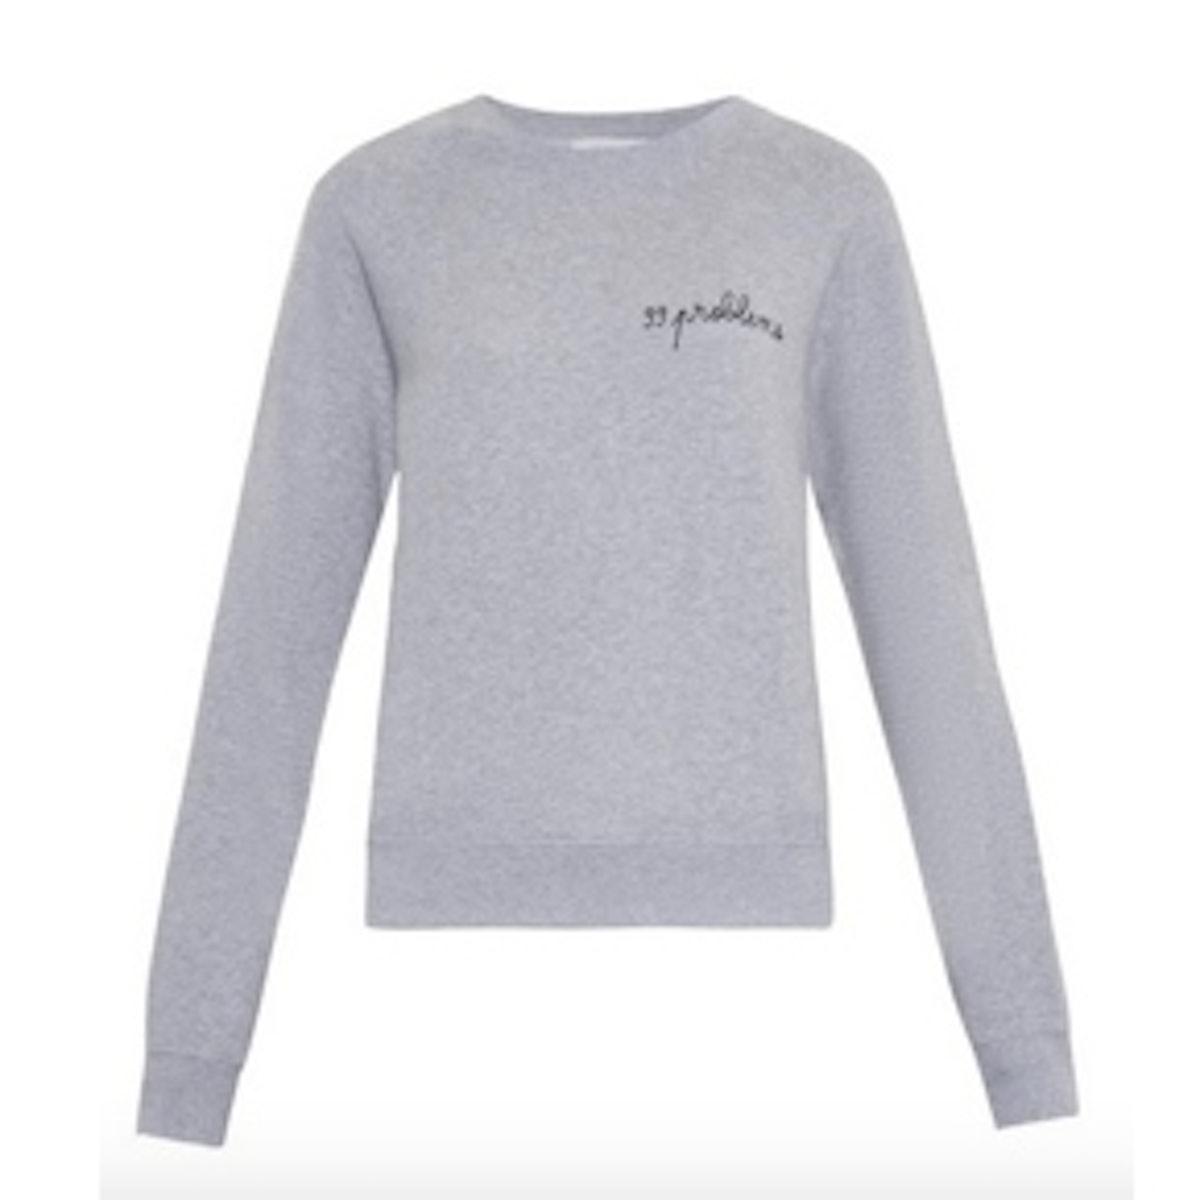 99 Problems Embroidered Sweatshirt